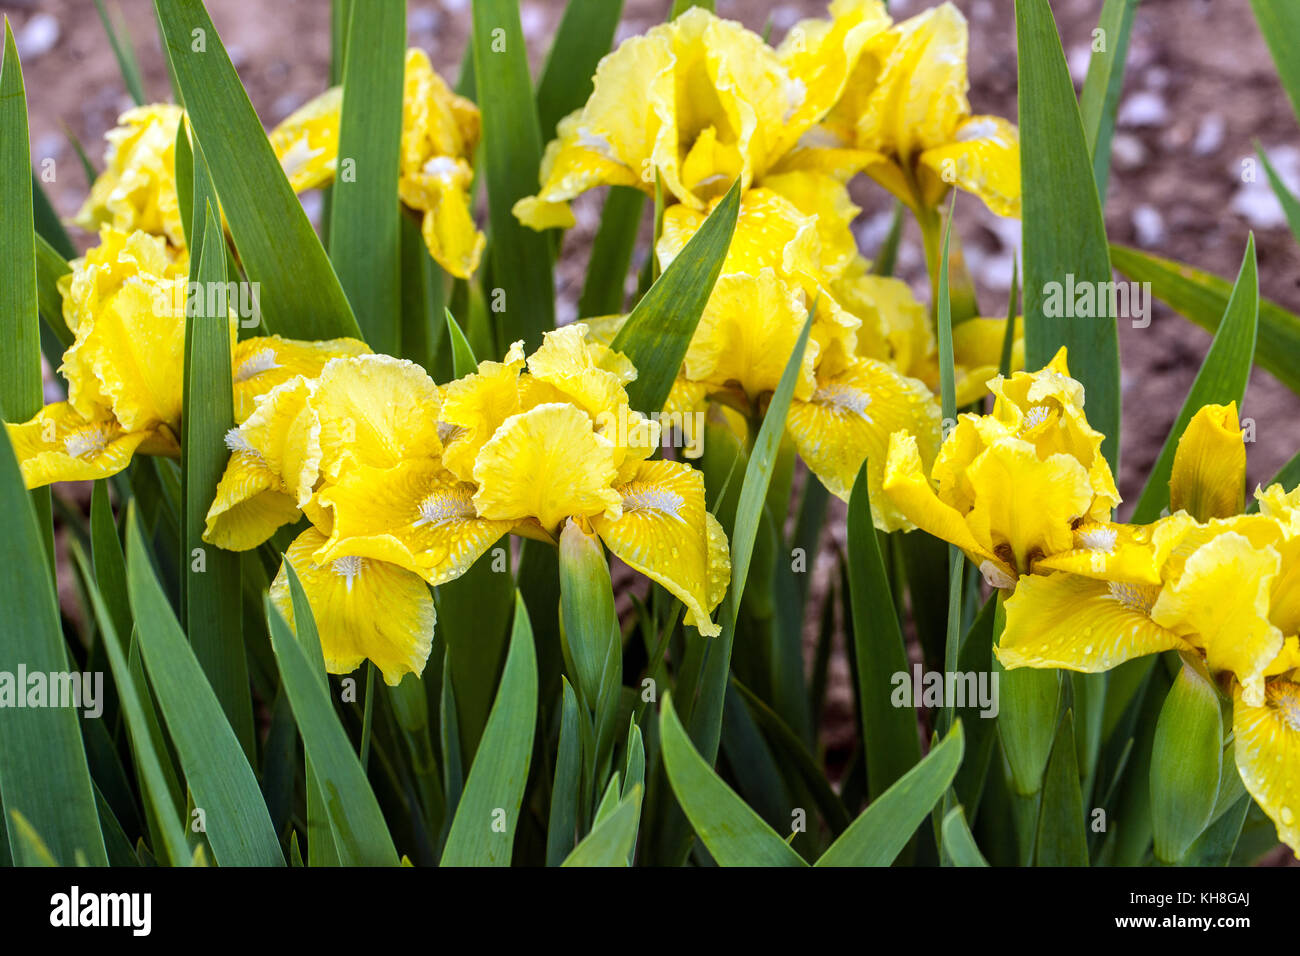 Iris flower garden sunlight stock photos iris flower garden dwarf barded iris iris barbata nana sunlight trail stock image izmirmasajfo